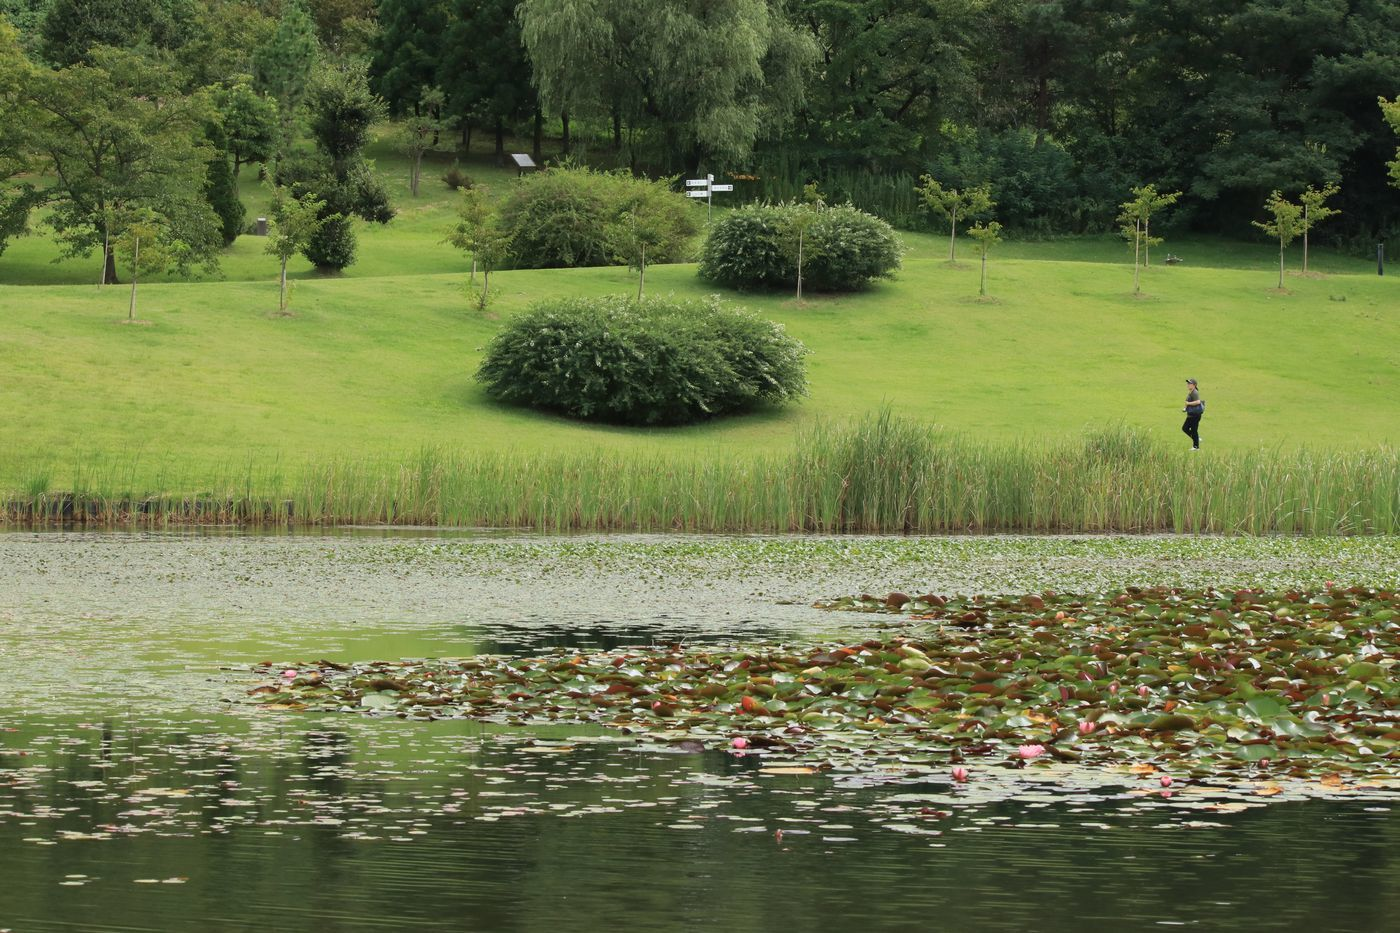 ●S2017・9・16県立植物園_87